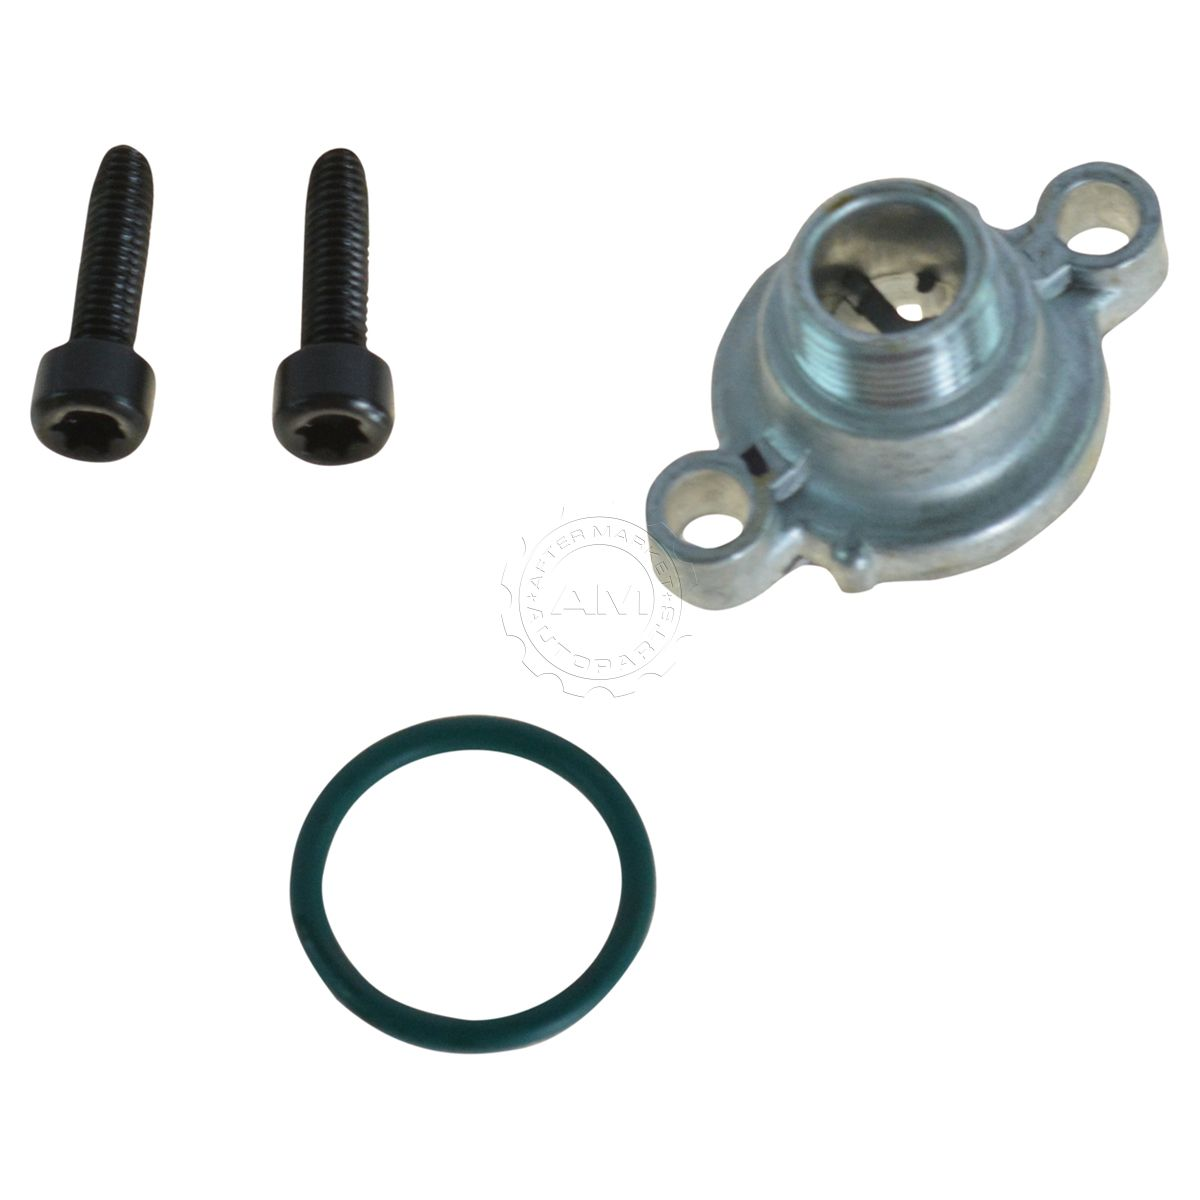 hight resolution of motorcraft cm5016 fuel filter press relief valve cap kit for ford truck van 7 3l